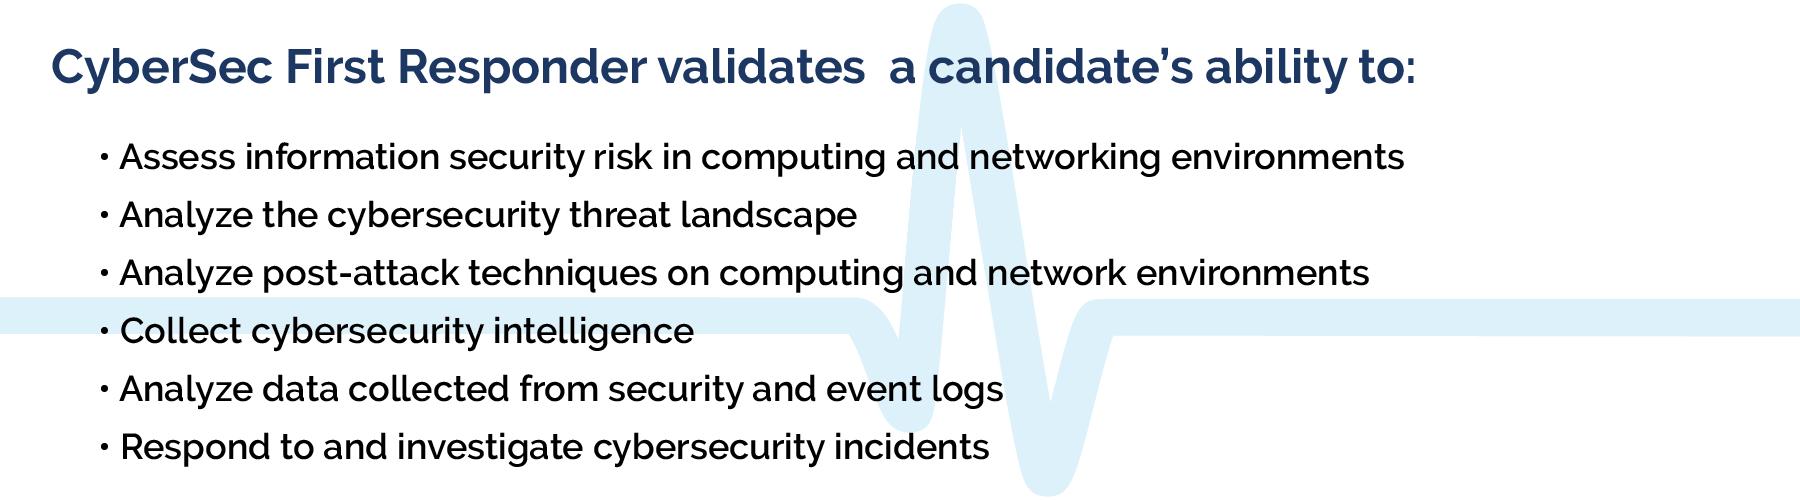 cfr-validation-list